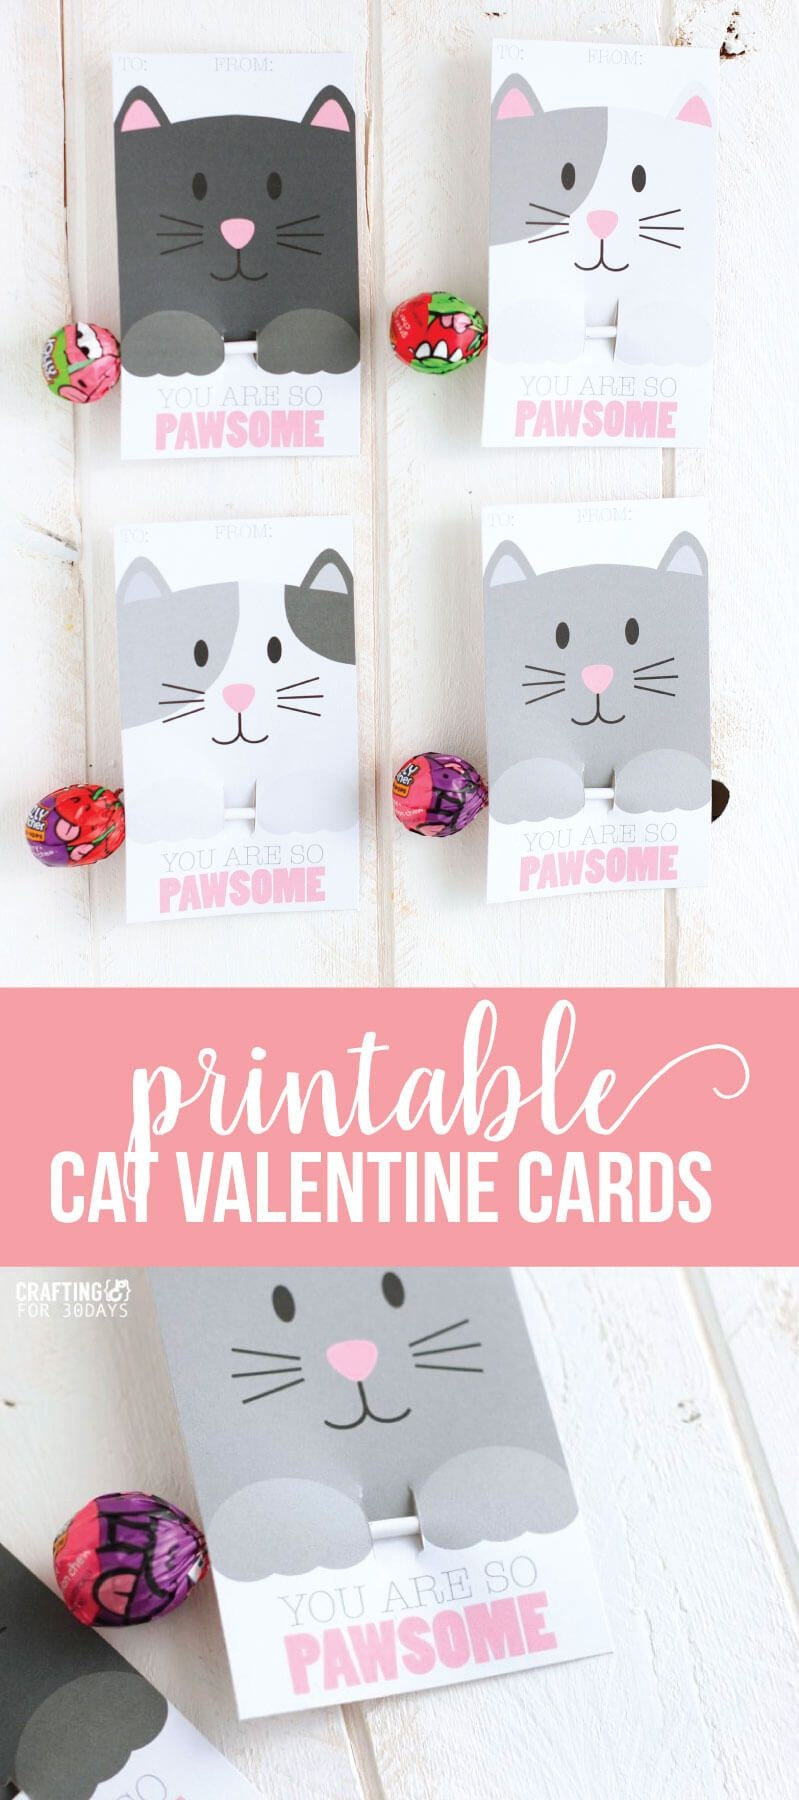 Printable Cat Valentine Day Cards   Valentine's Day Love   Diy - Free Printable Cat Valentine Cards